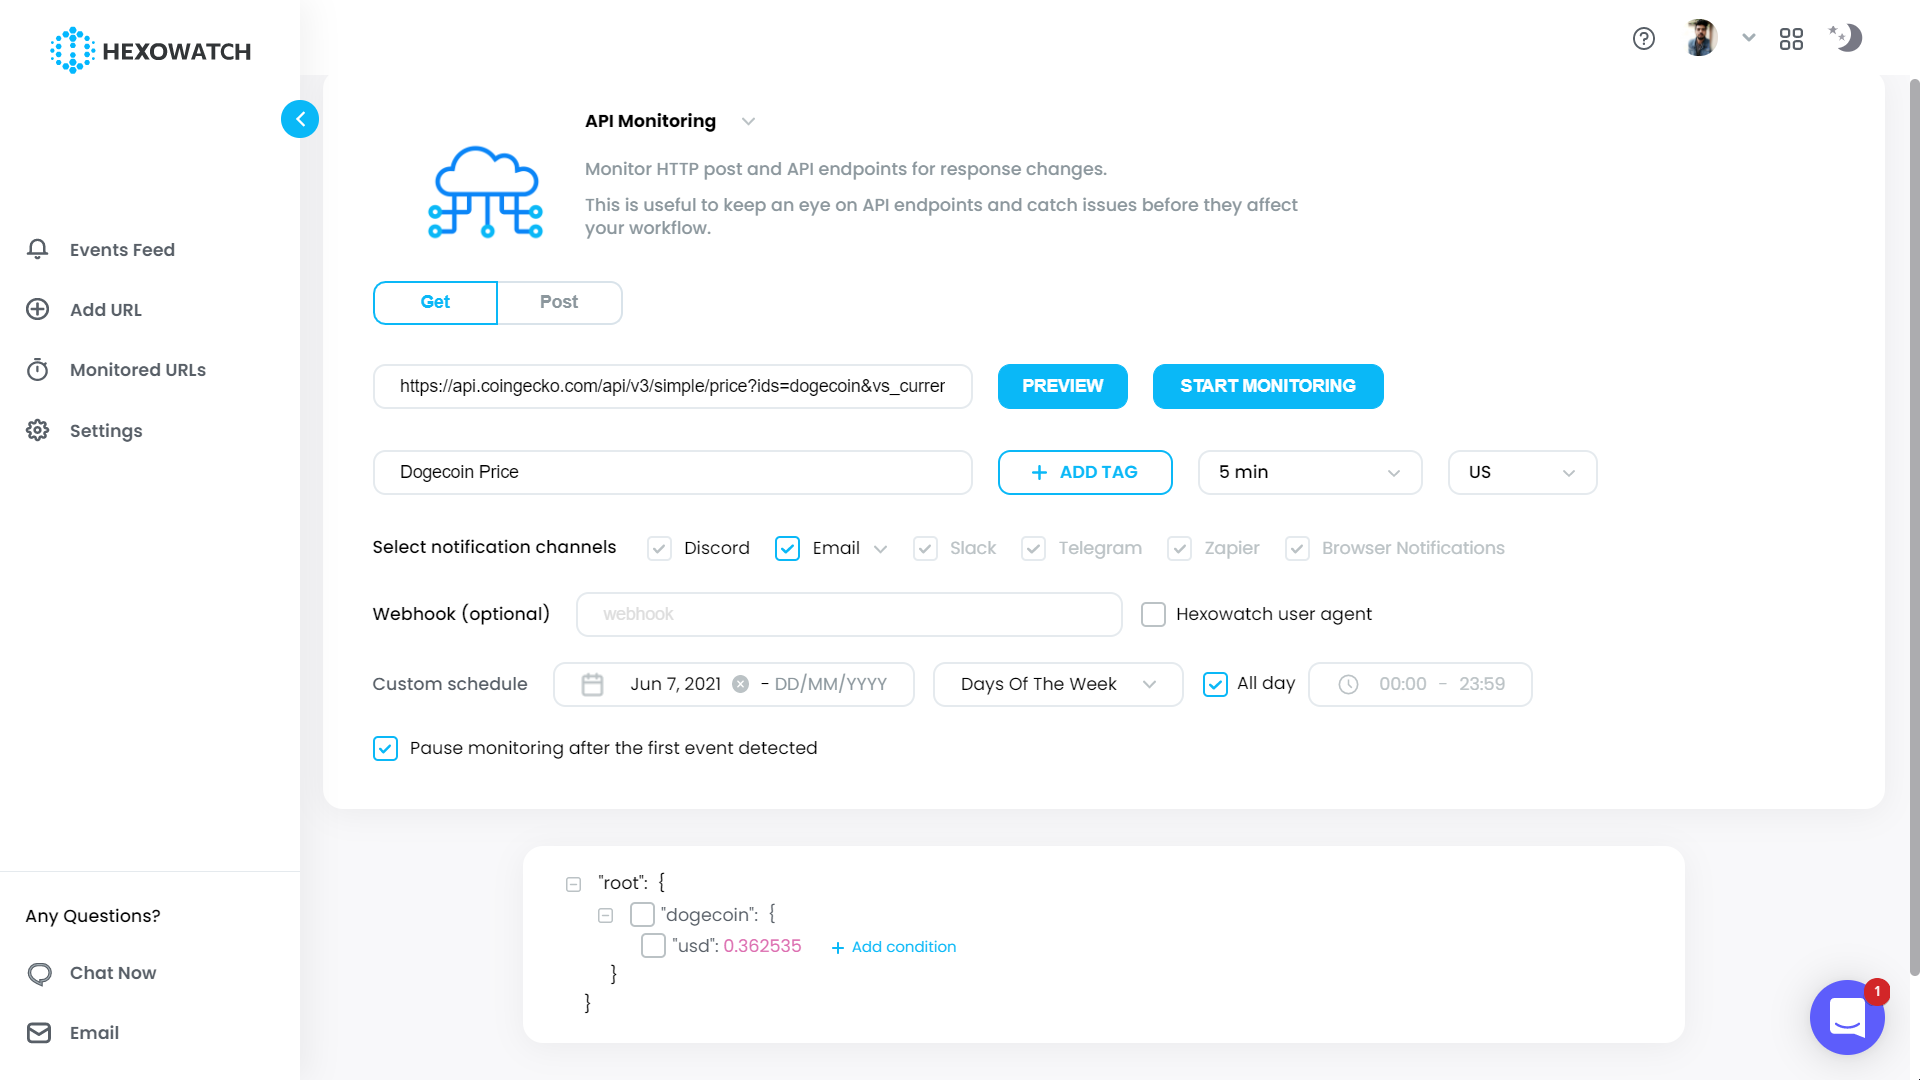 API Monitoring - Enter Details